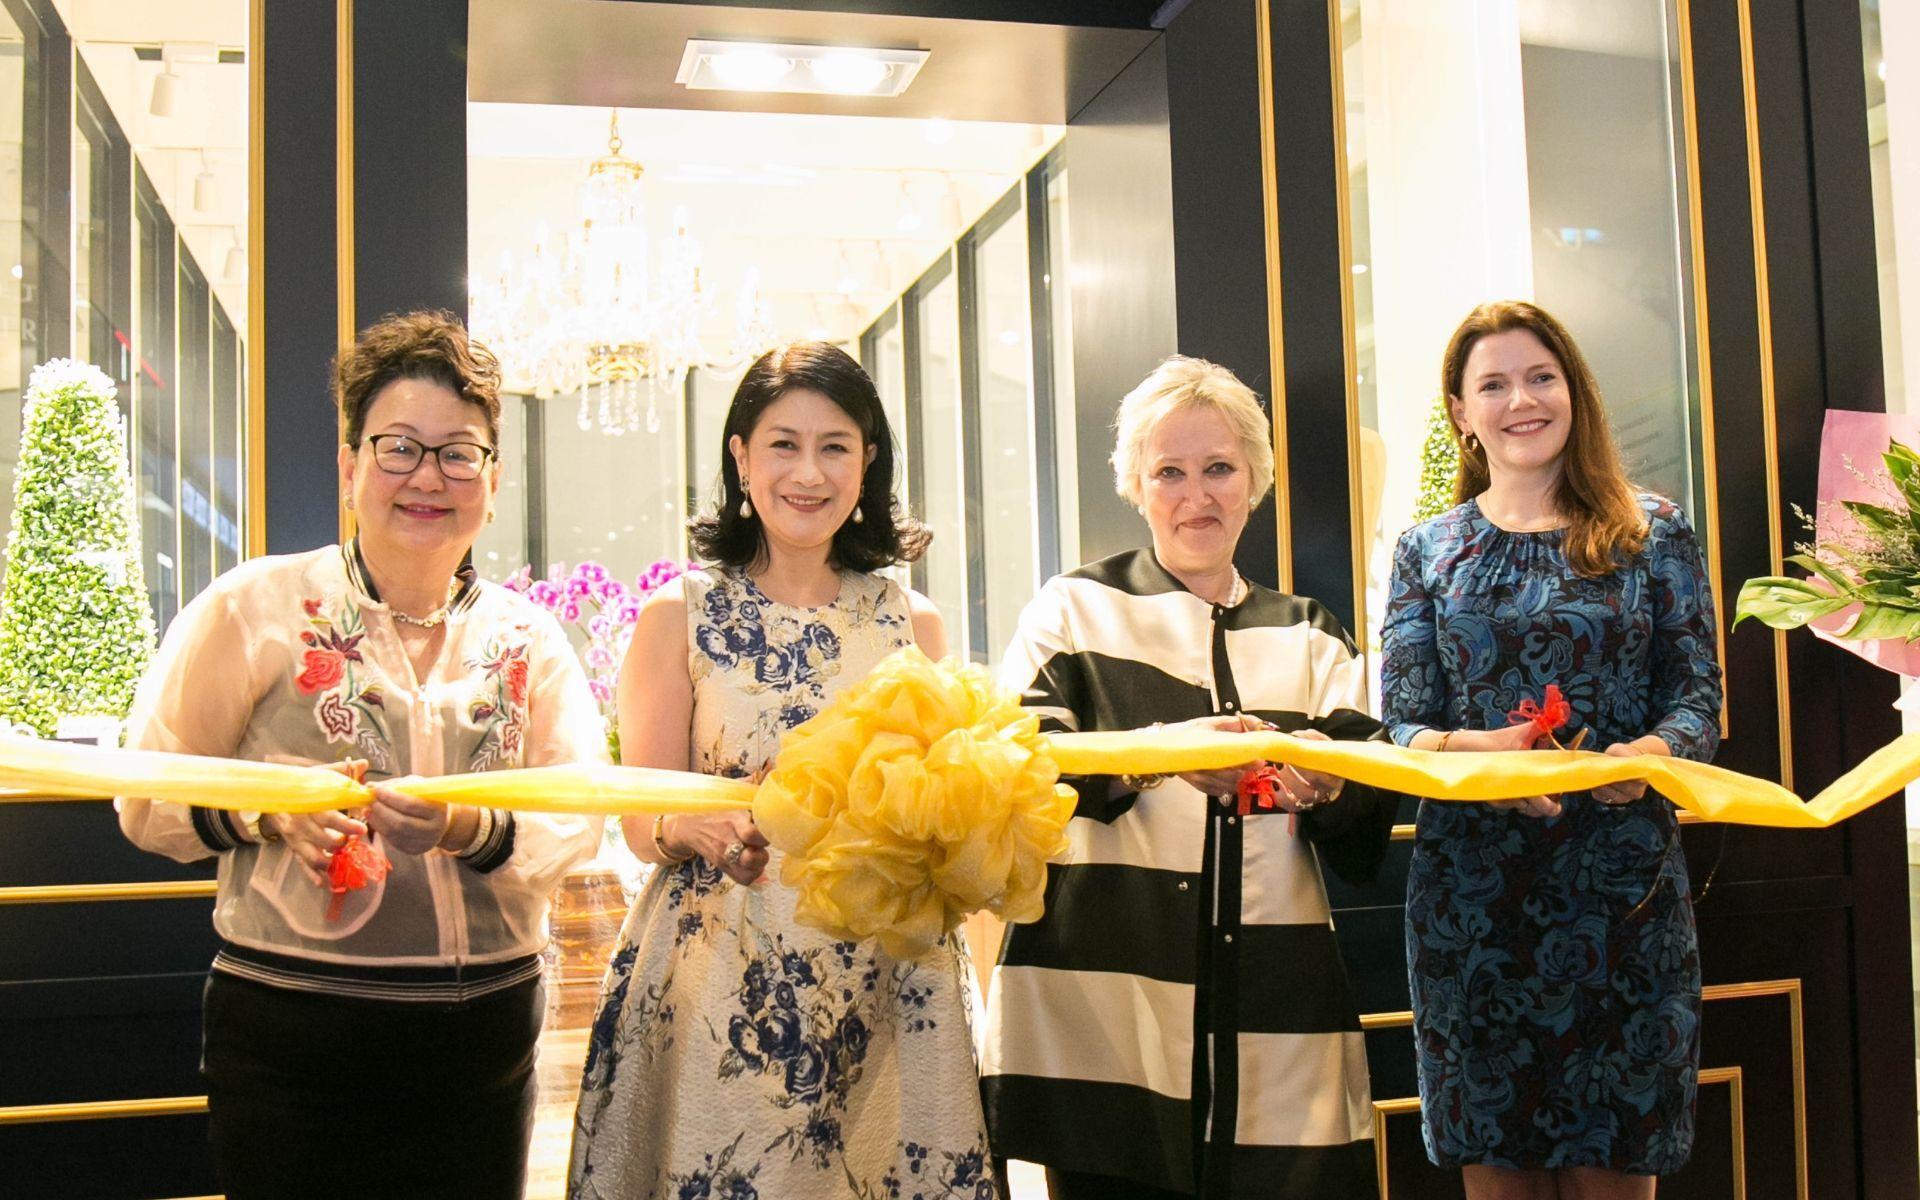 Dato' Joyce Yap, Soo Shea Pin, Pamela Harper and Natalie Black